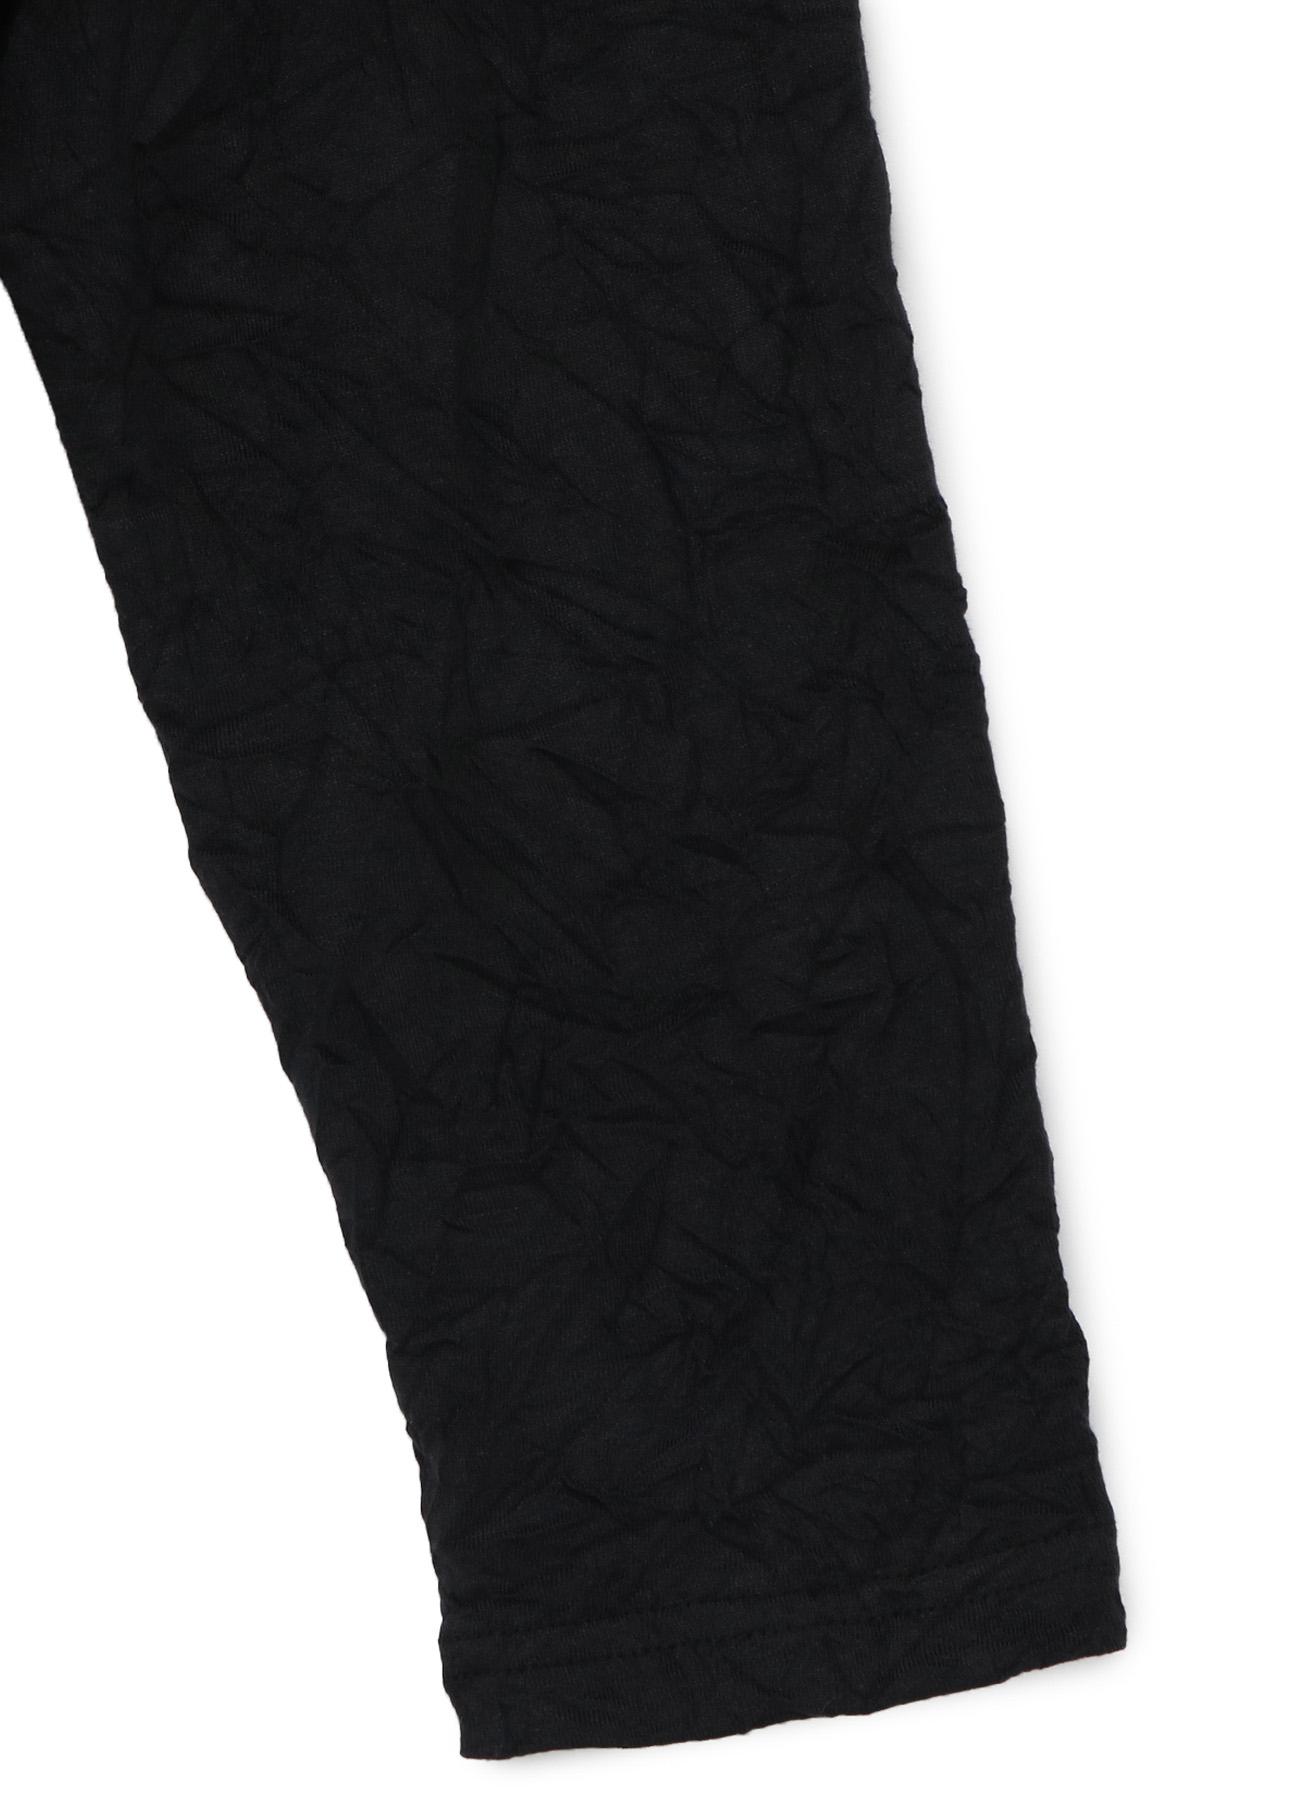 C/Pe Washer Jersey Front Notch Cut Sew